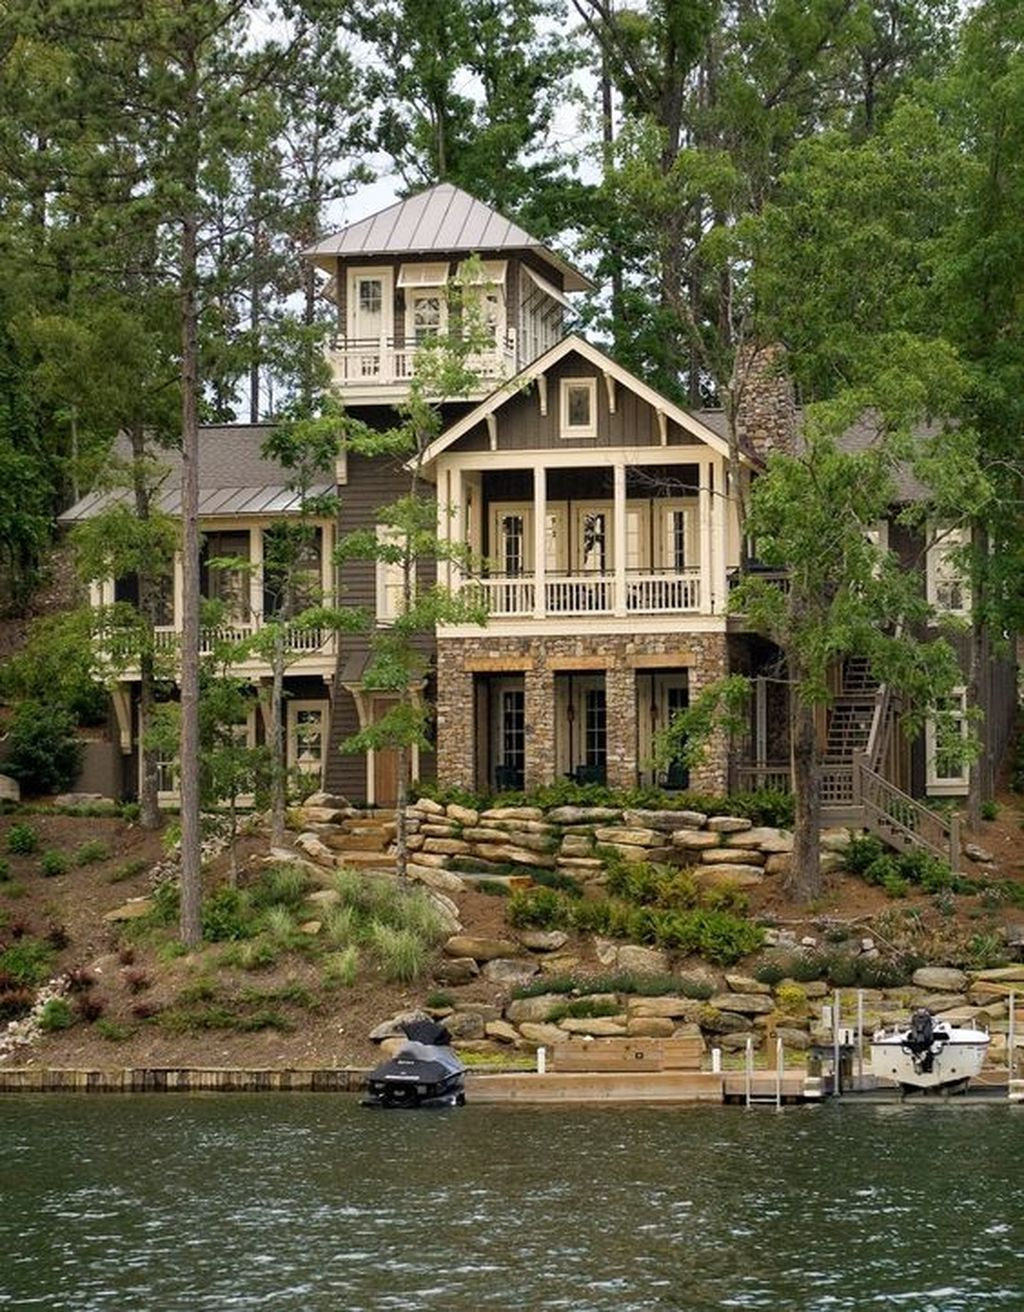 46 Creative Lake House Exterior Designs Ideas With Images Lake Houses Exterior Lake House